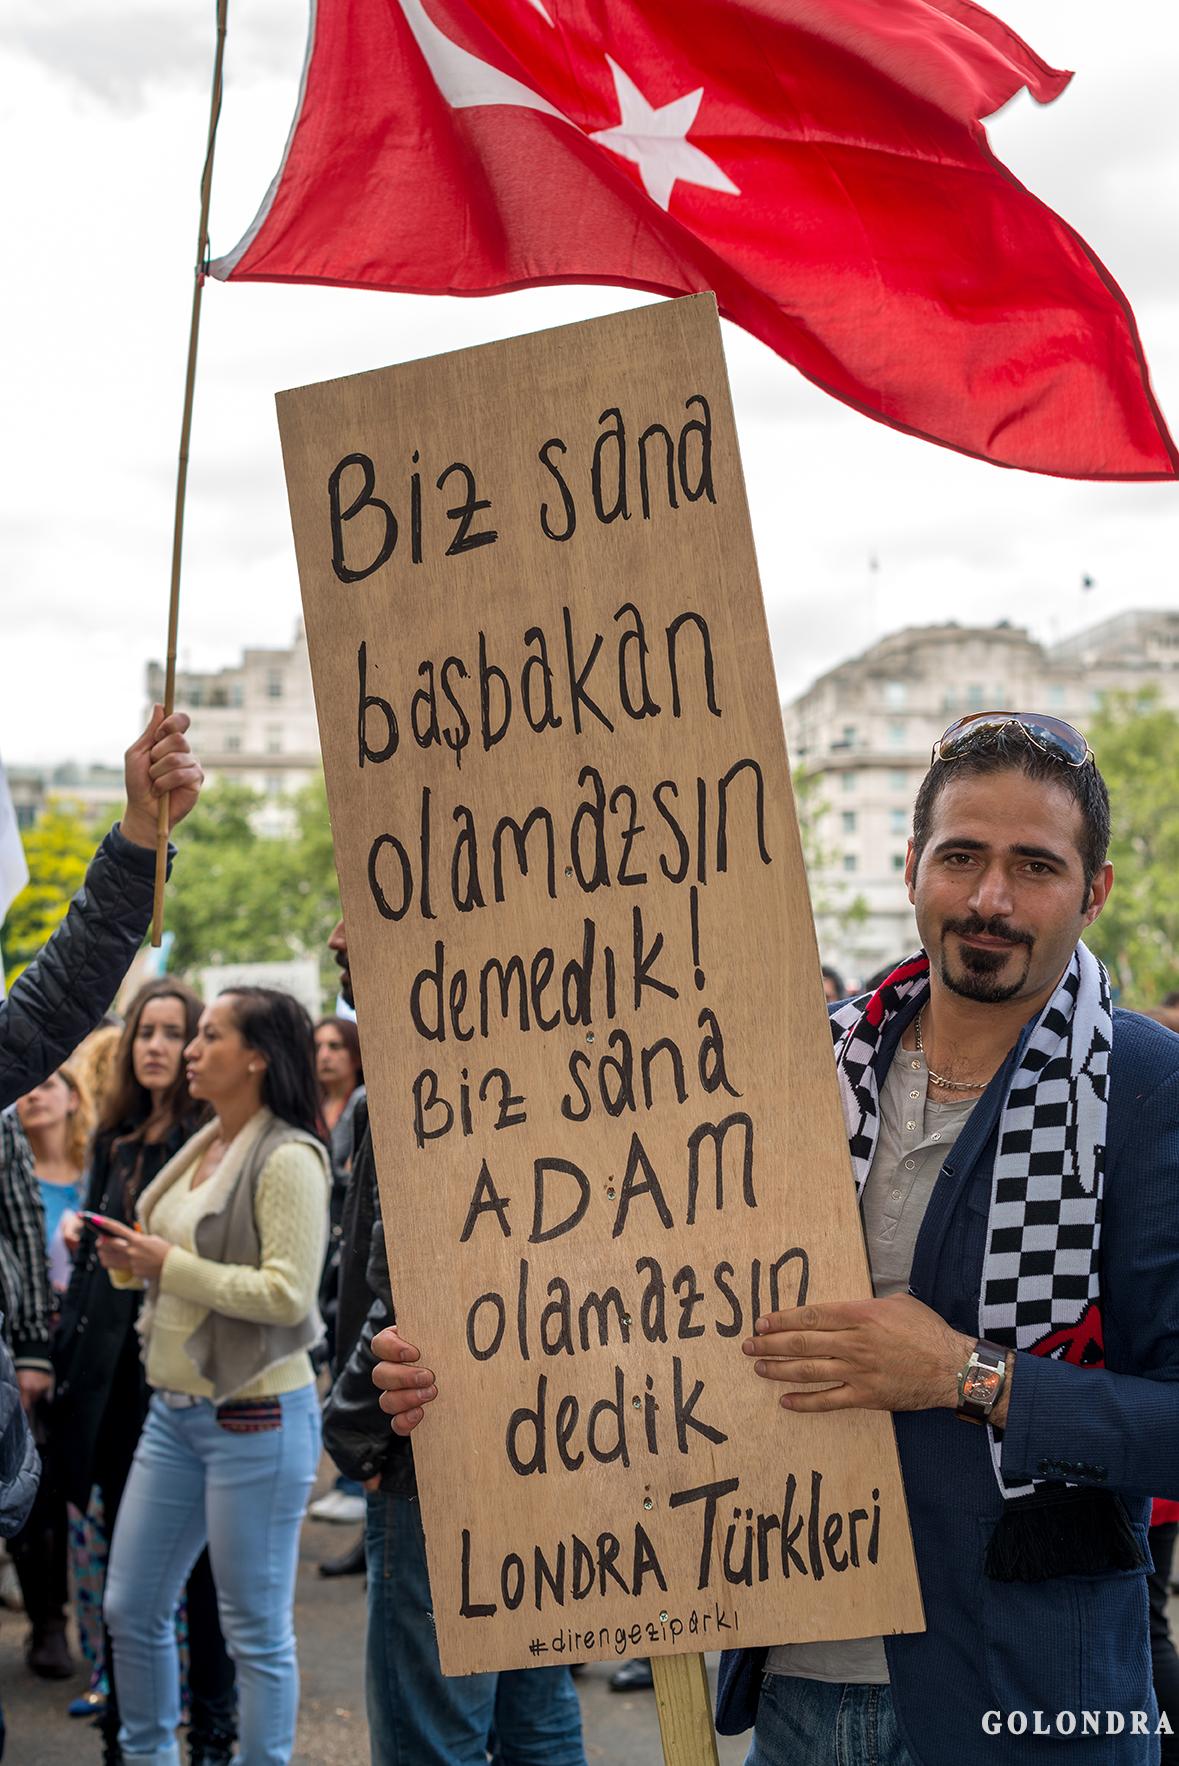 Protesting Turkish Government - Turk Hukumetini Protesto - Londra - London (26)